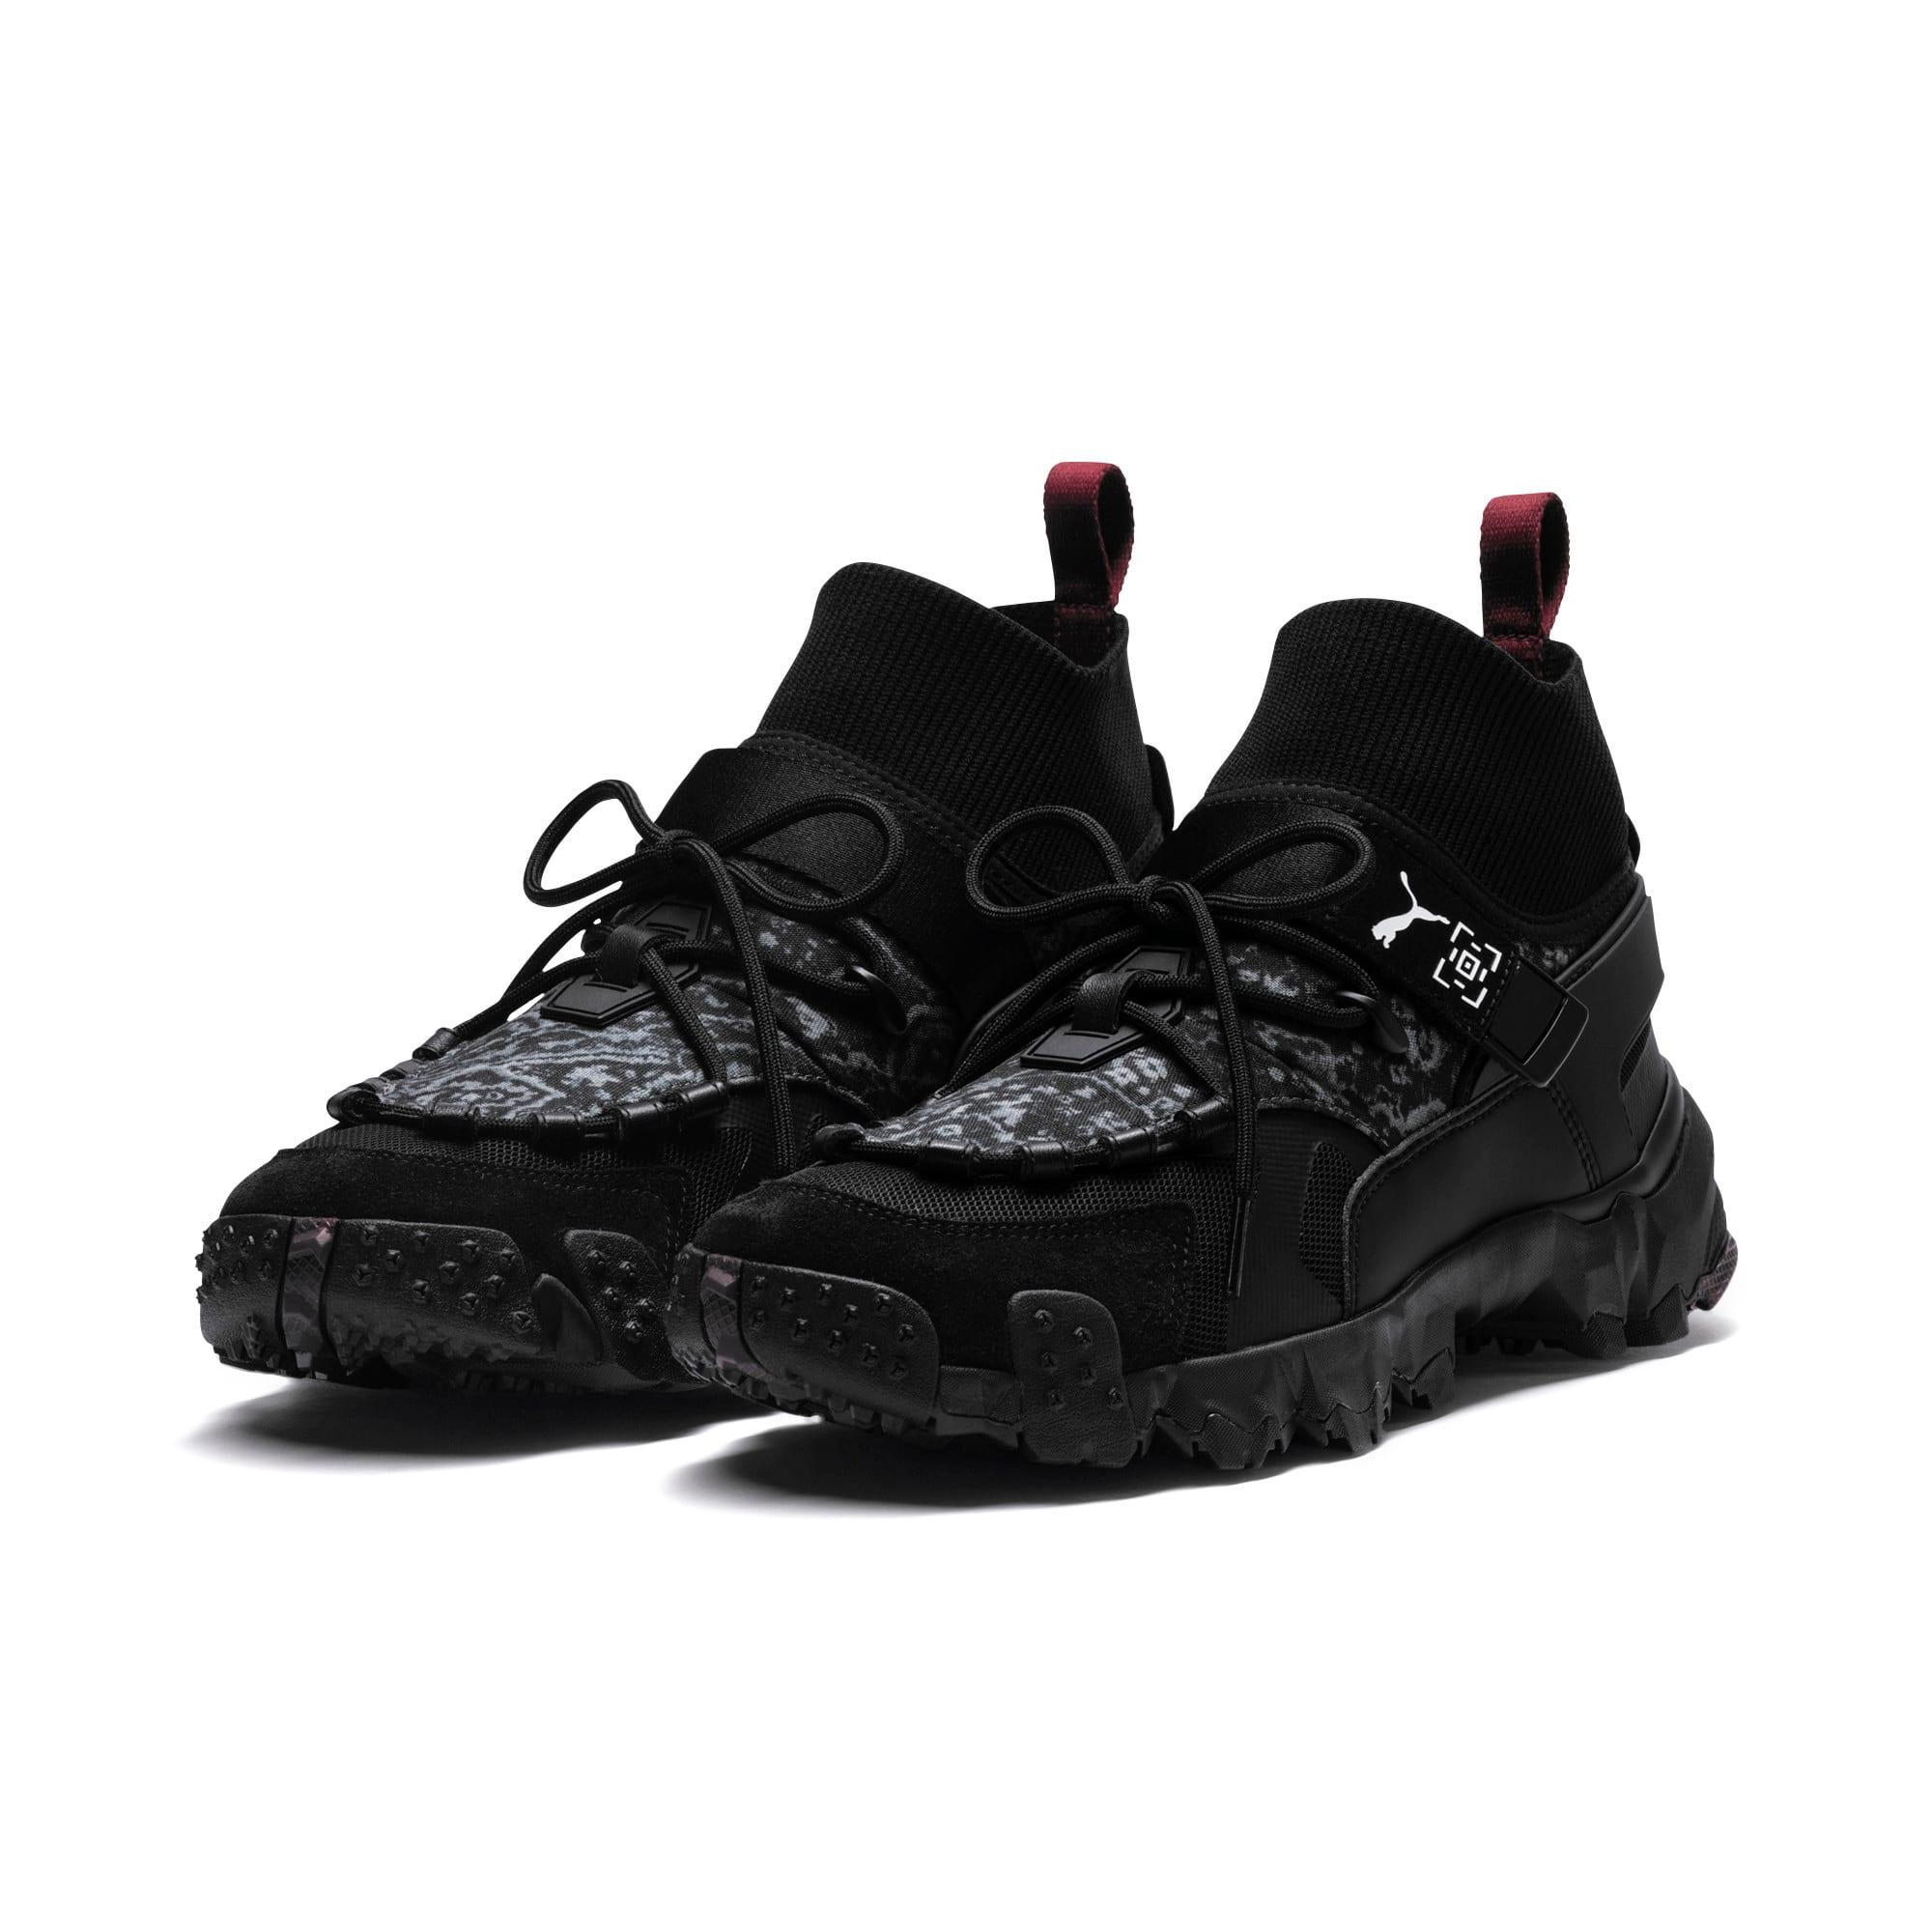 Thumbnail 3 van PUMA x LES BENJAMINS Trailfox schoenen, Puma Black, medium